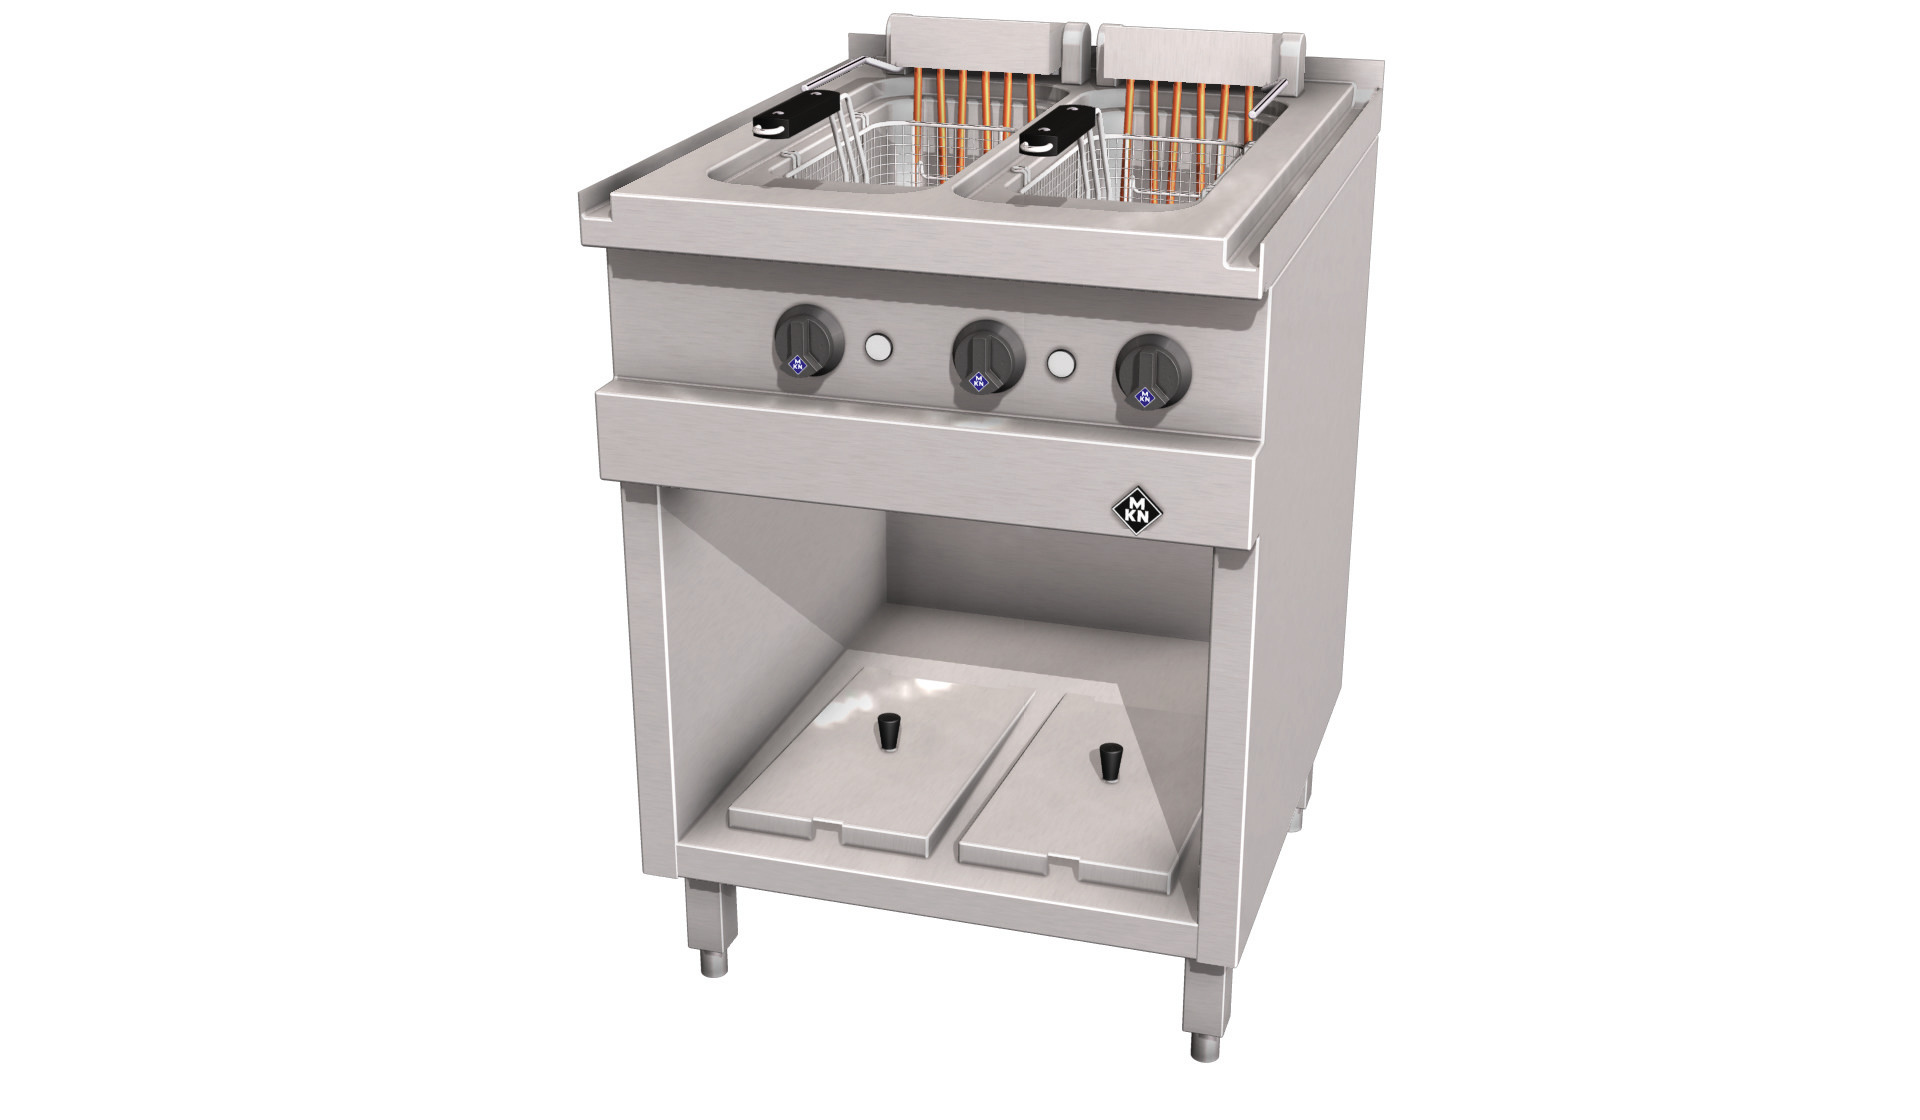 Elektro-Fritteuse 2 x 12,50 l /London II 12,00 kW /600 x 700 x 700 mm/Optima 700